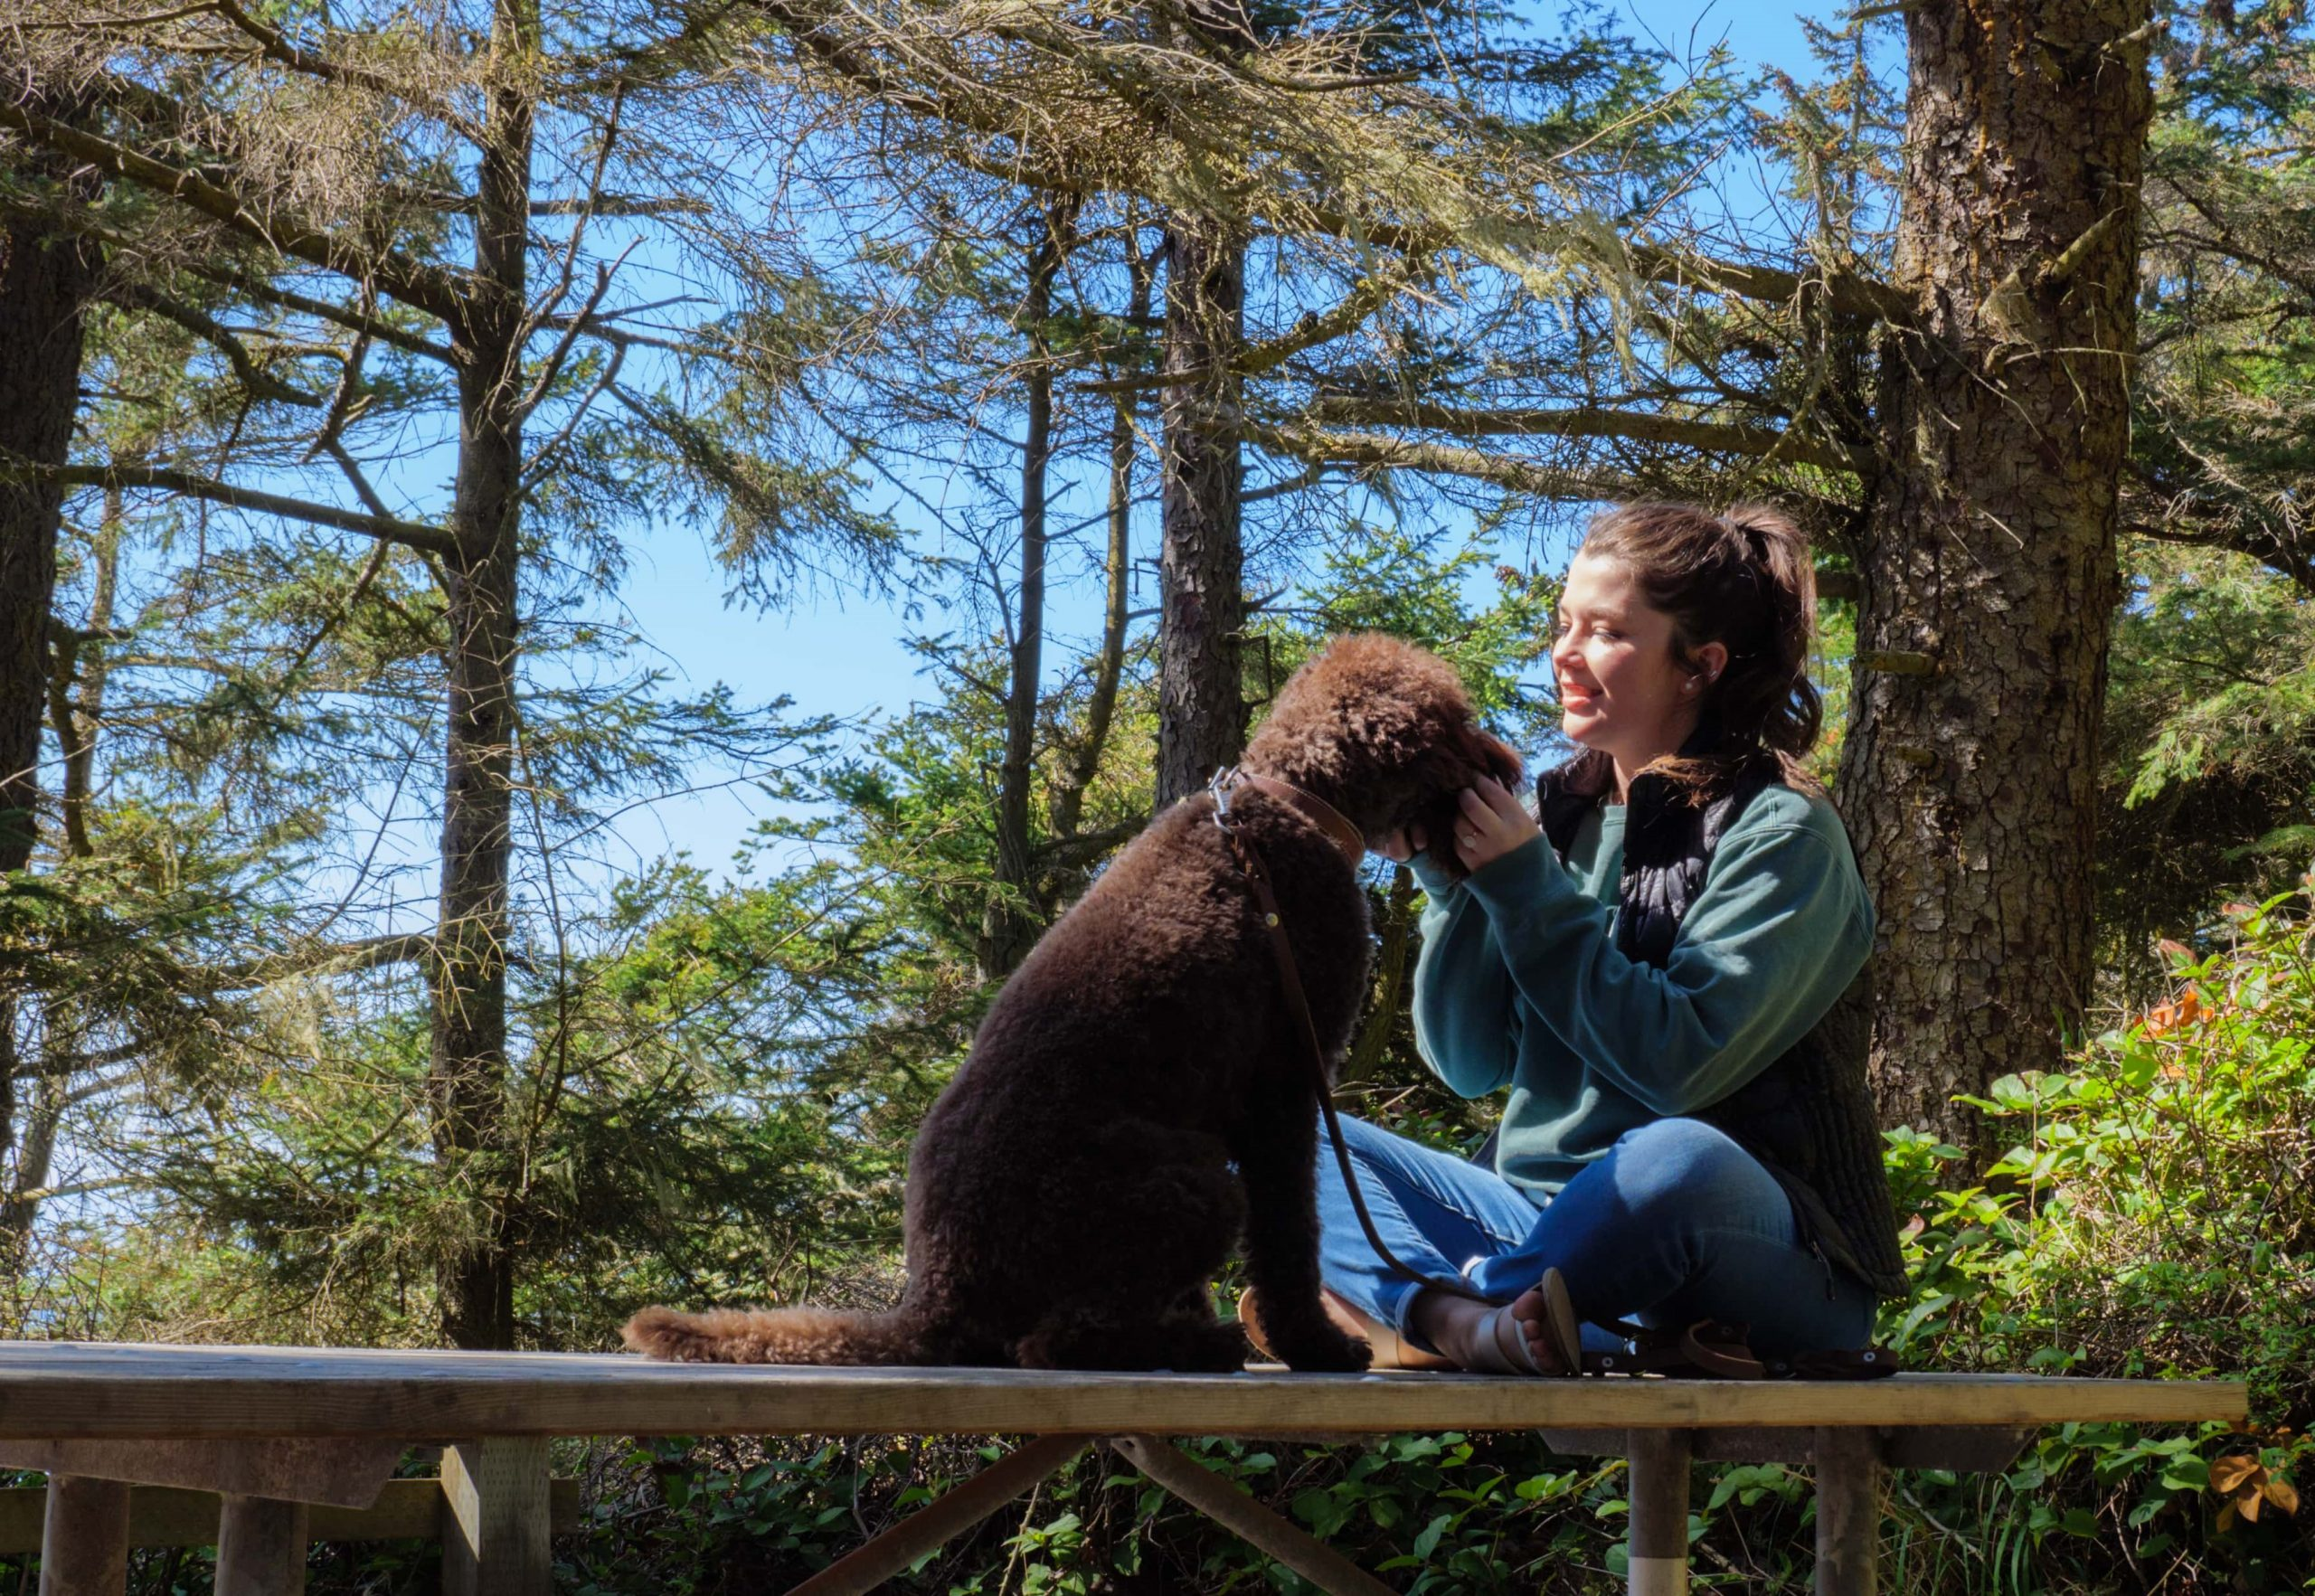 Tori and her dog Kai